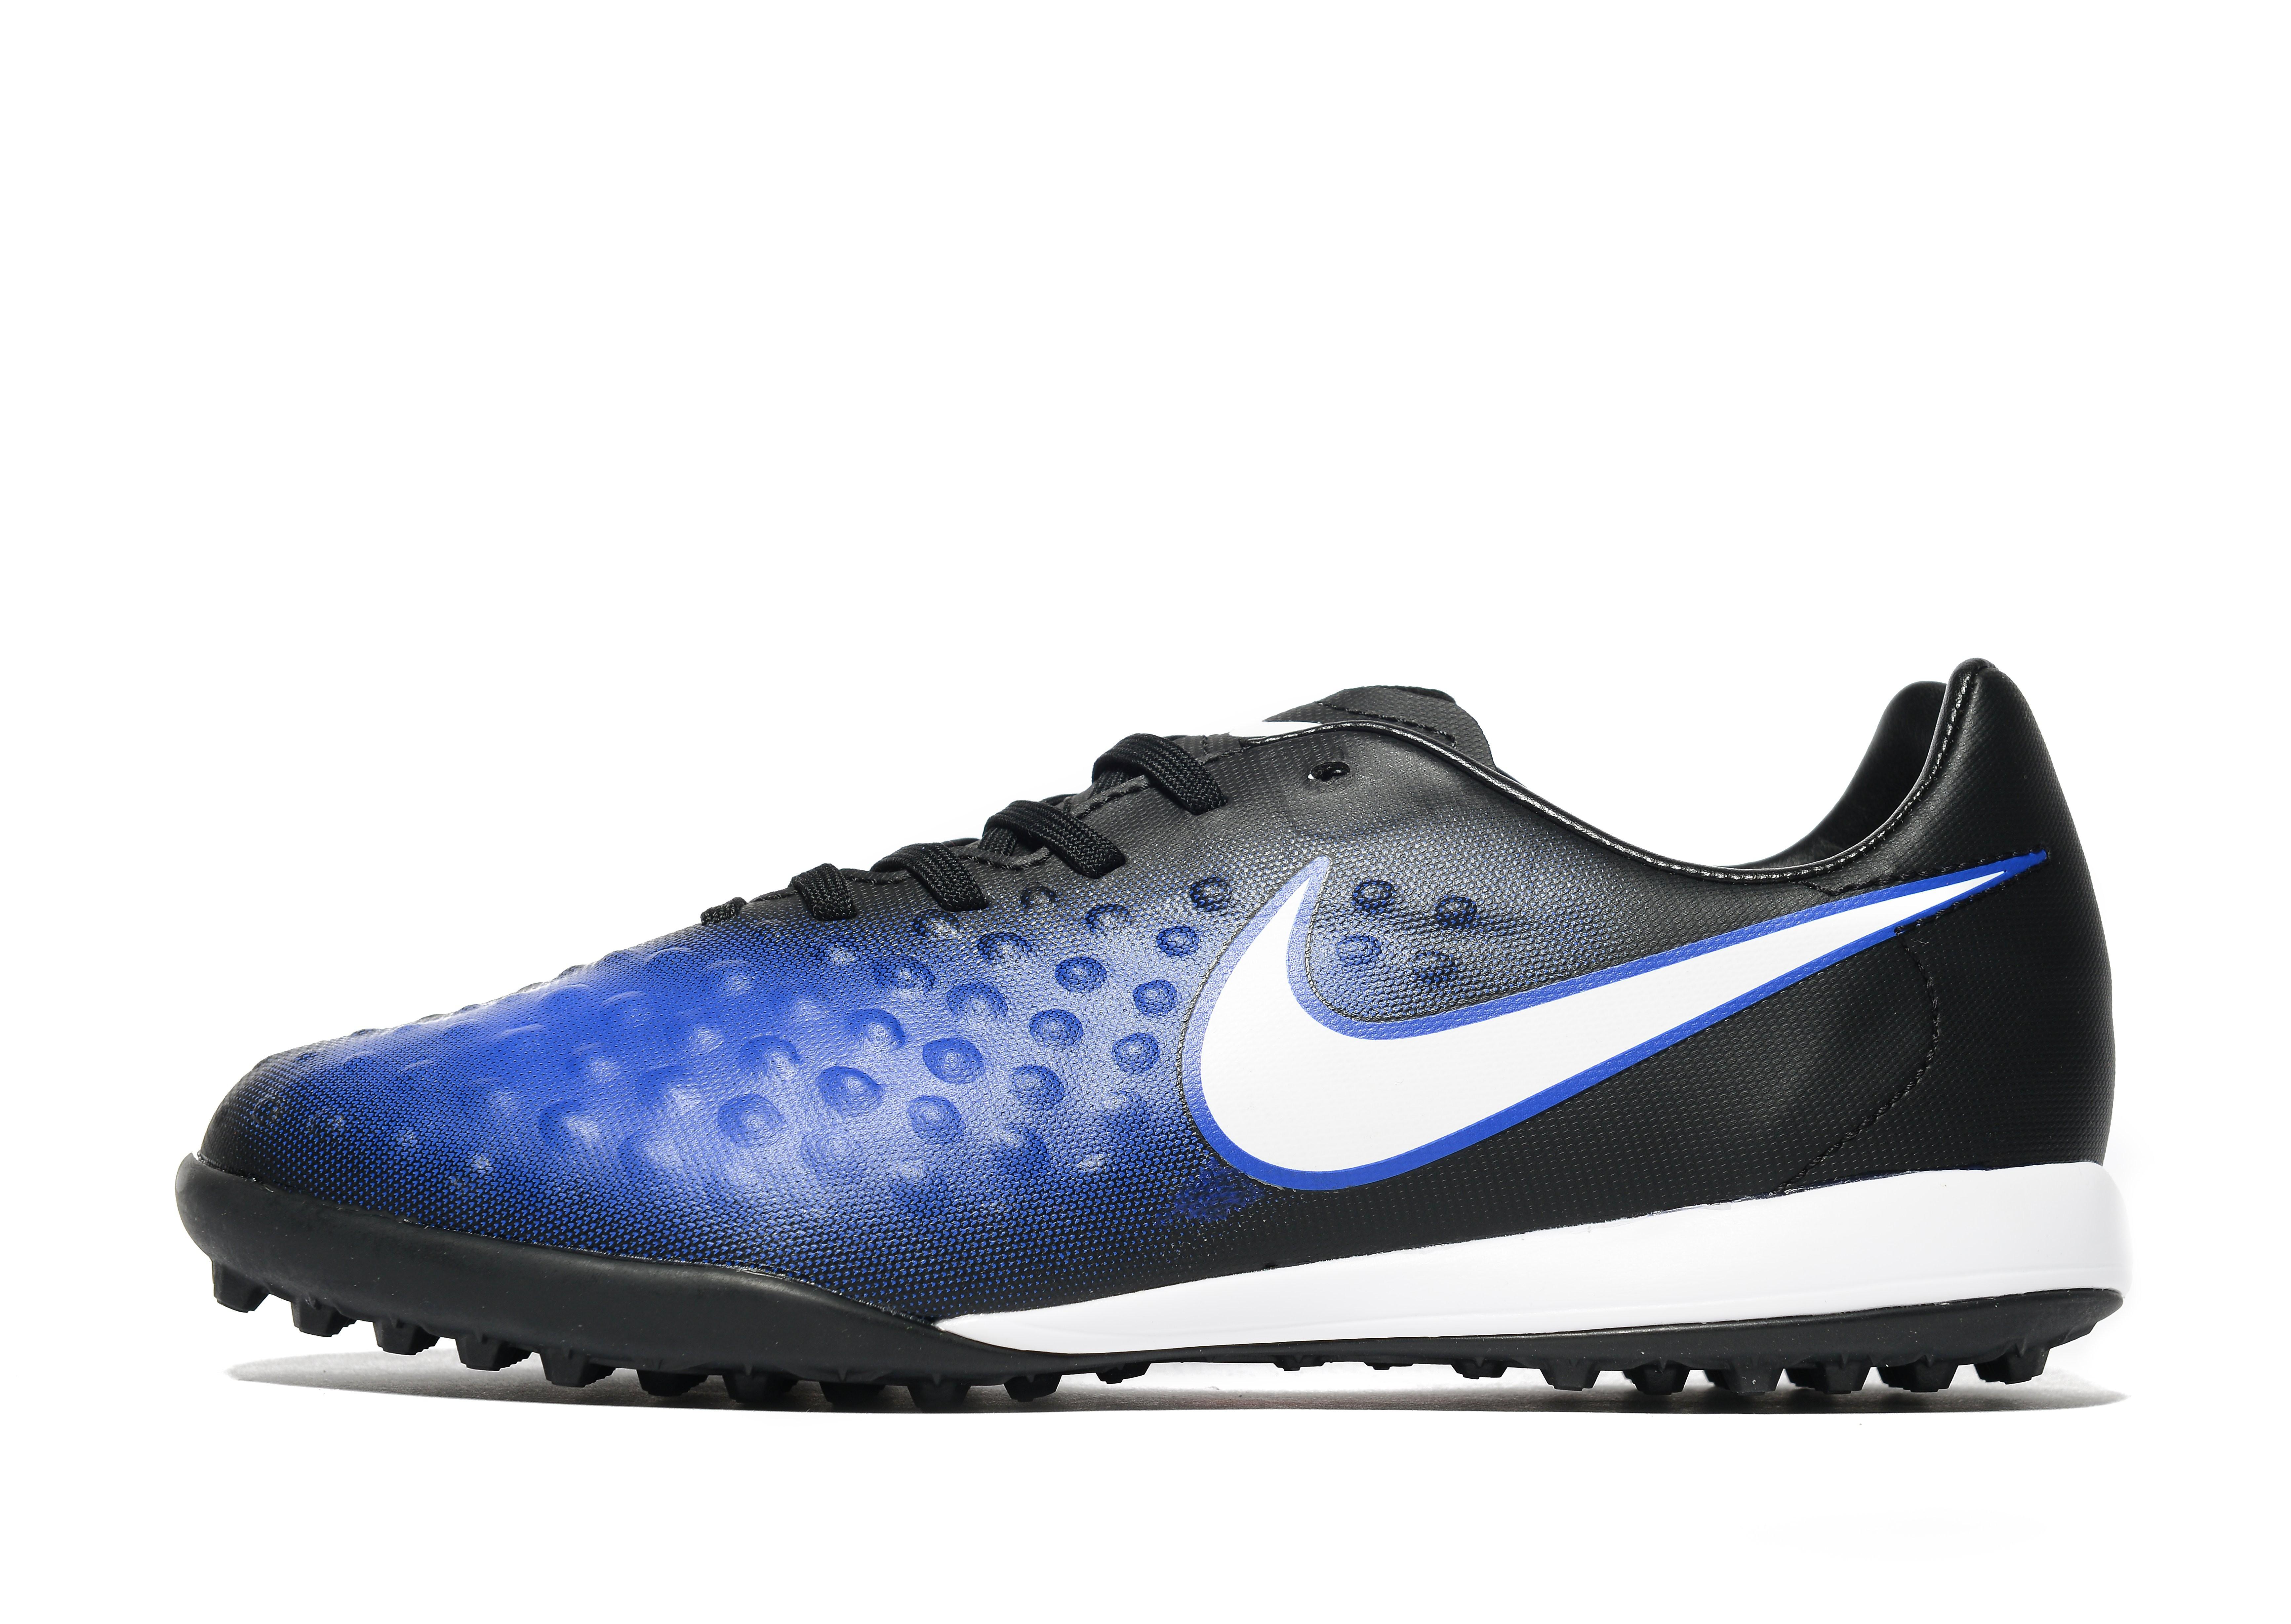 Nike Dark Lightning Magista Opus II Turf Junior